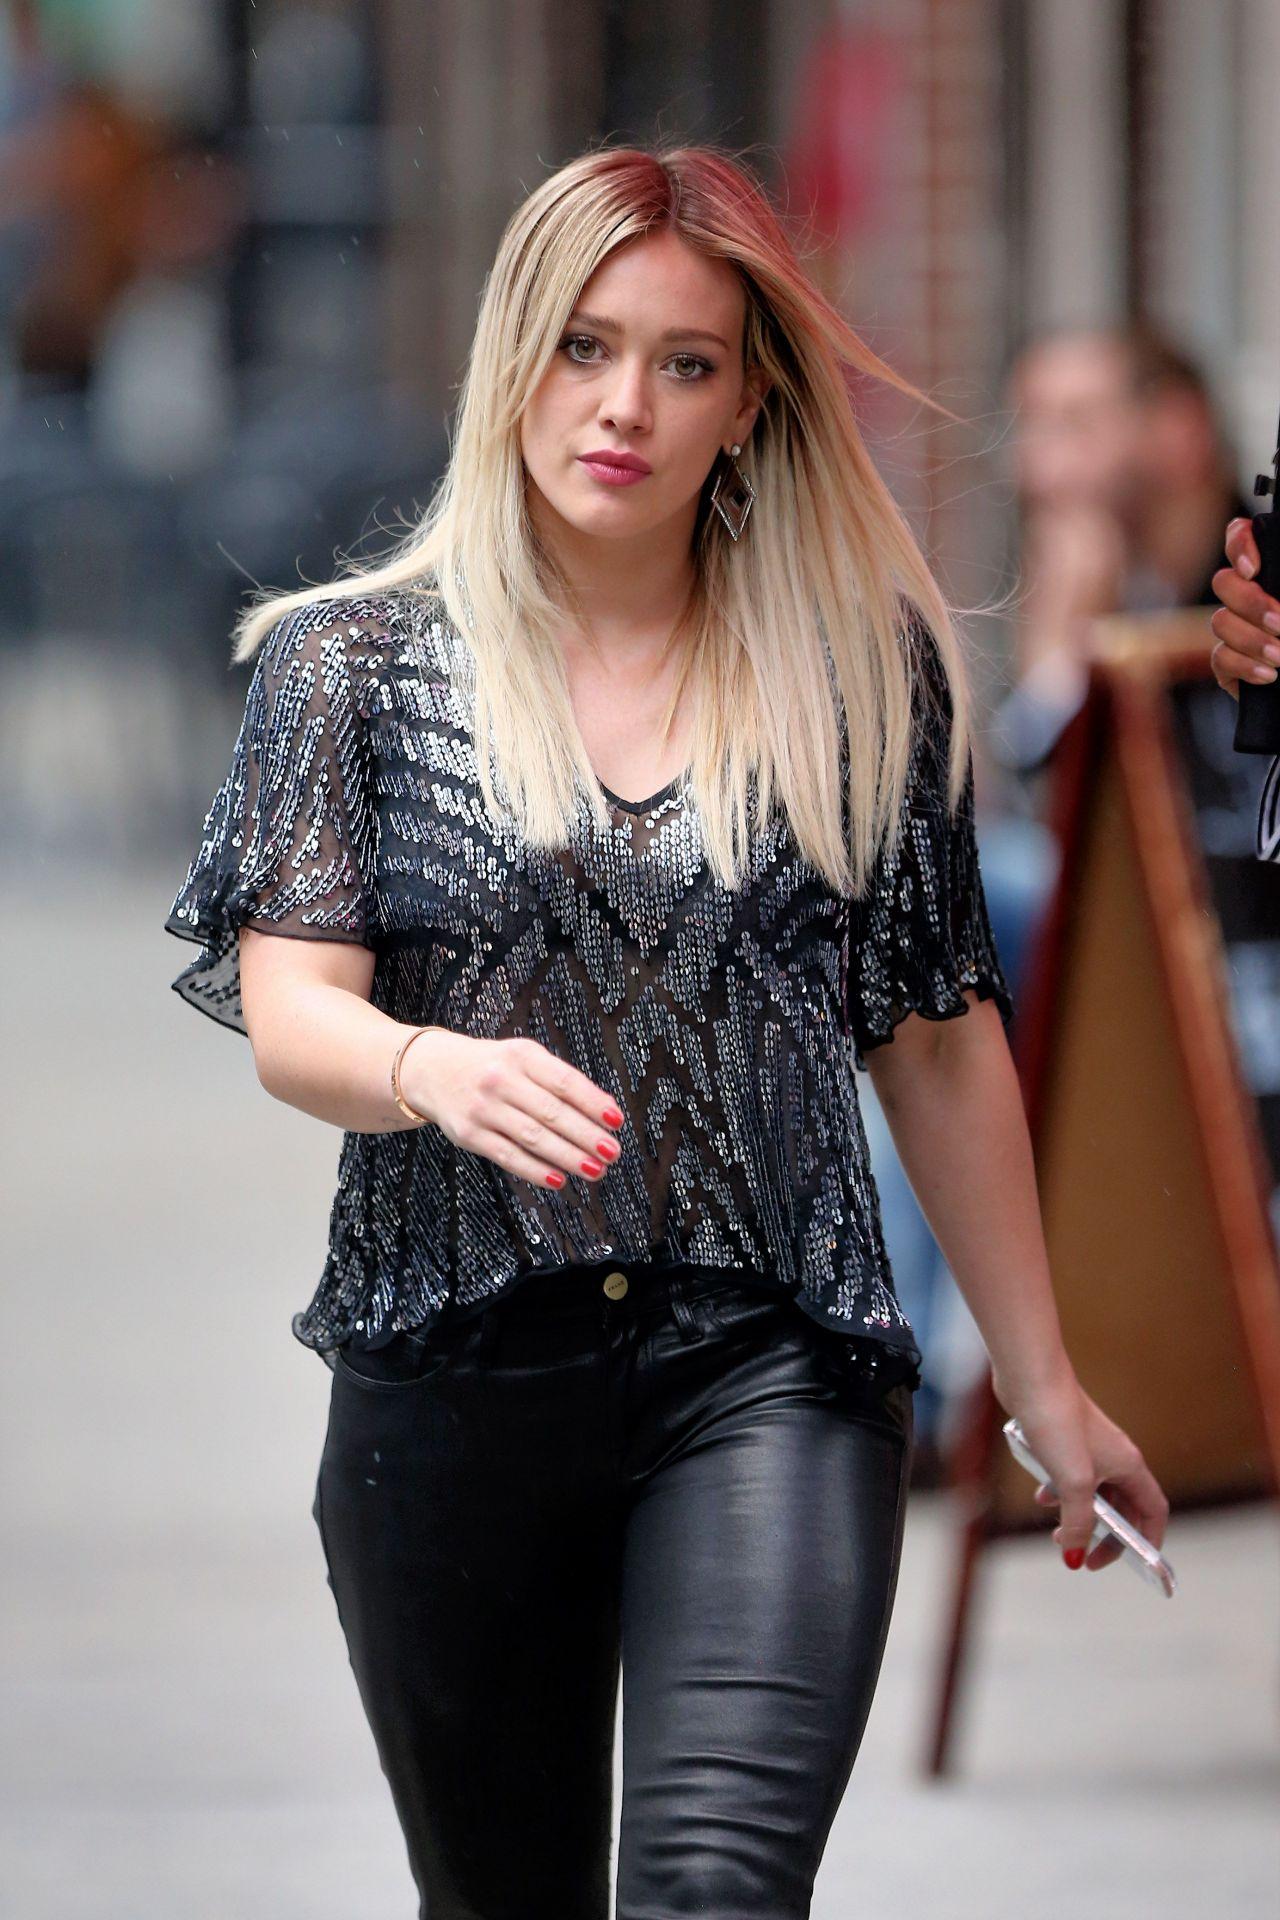 Hilary Duff Backgrounds, Compatible - PC, Mobile, Gadgets| 1280x1920 px